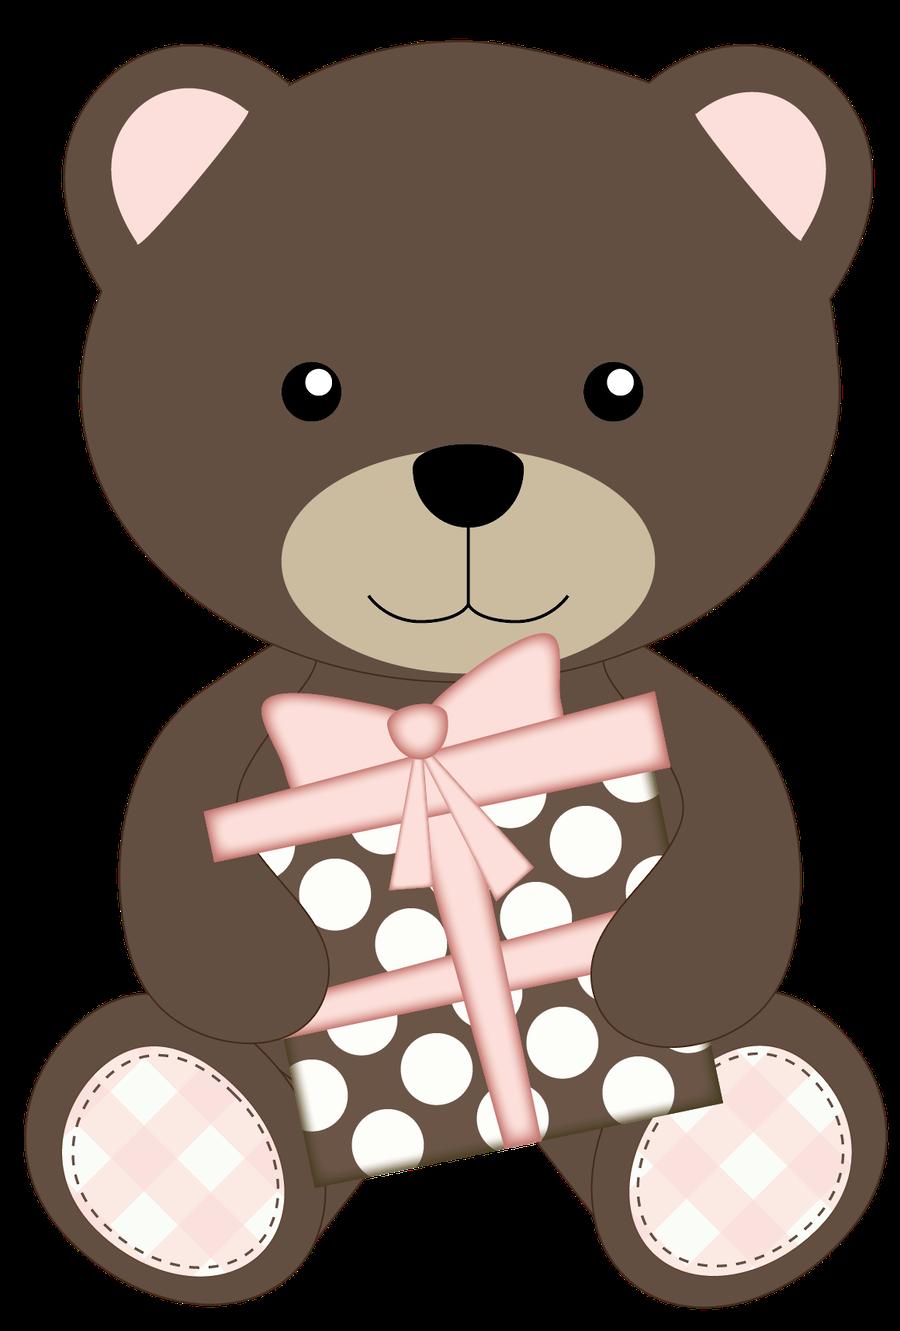 http danimfalcao minus com mygimocebbww minus pinterest rh pinterest com au baby bear clip art images free baby bear clipart